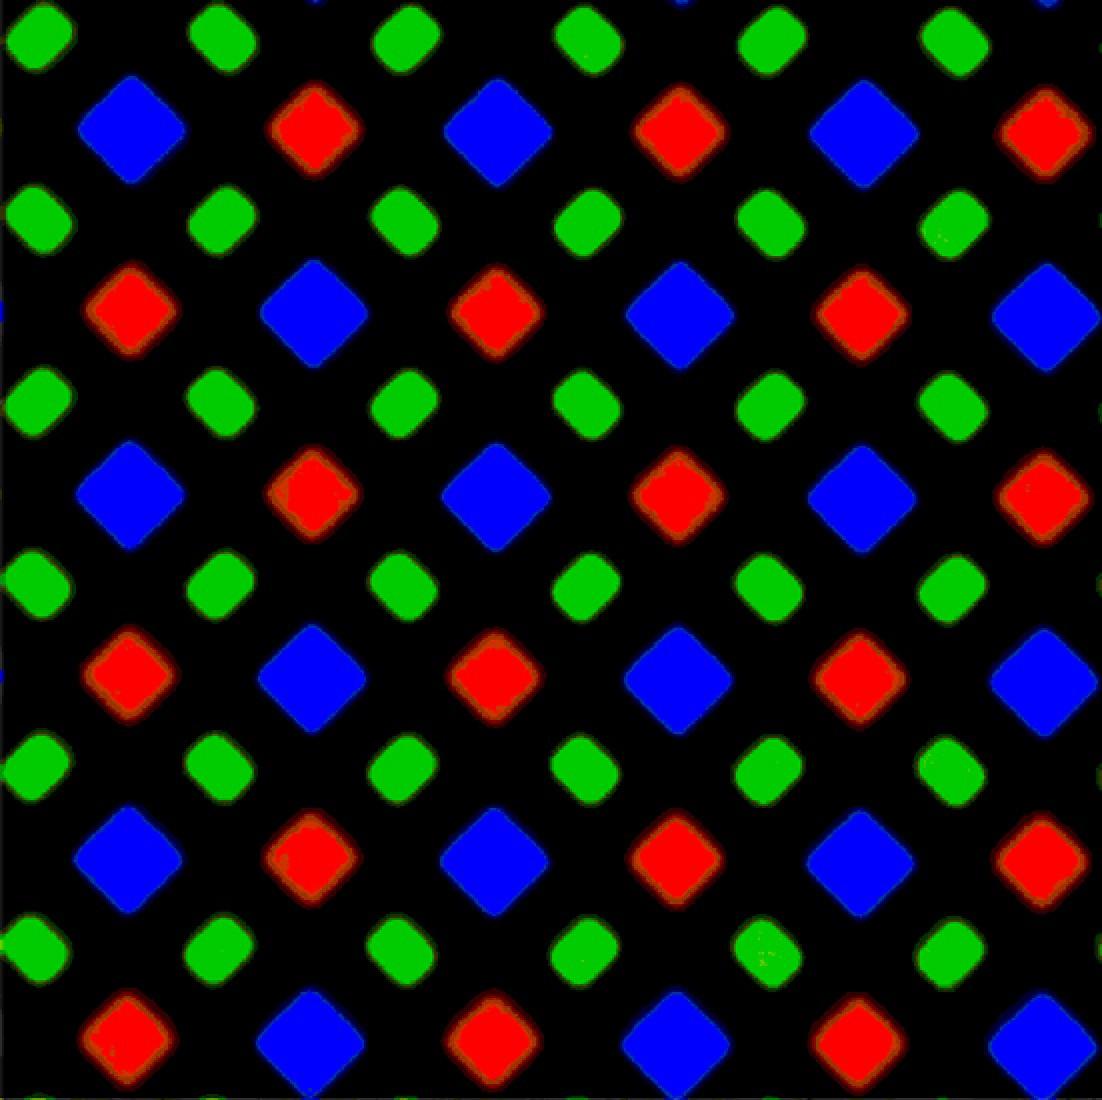 Patrón de subpixeles en constituye de diamante (pantalla del iPhone X)